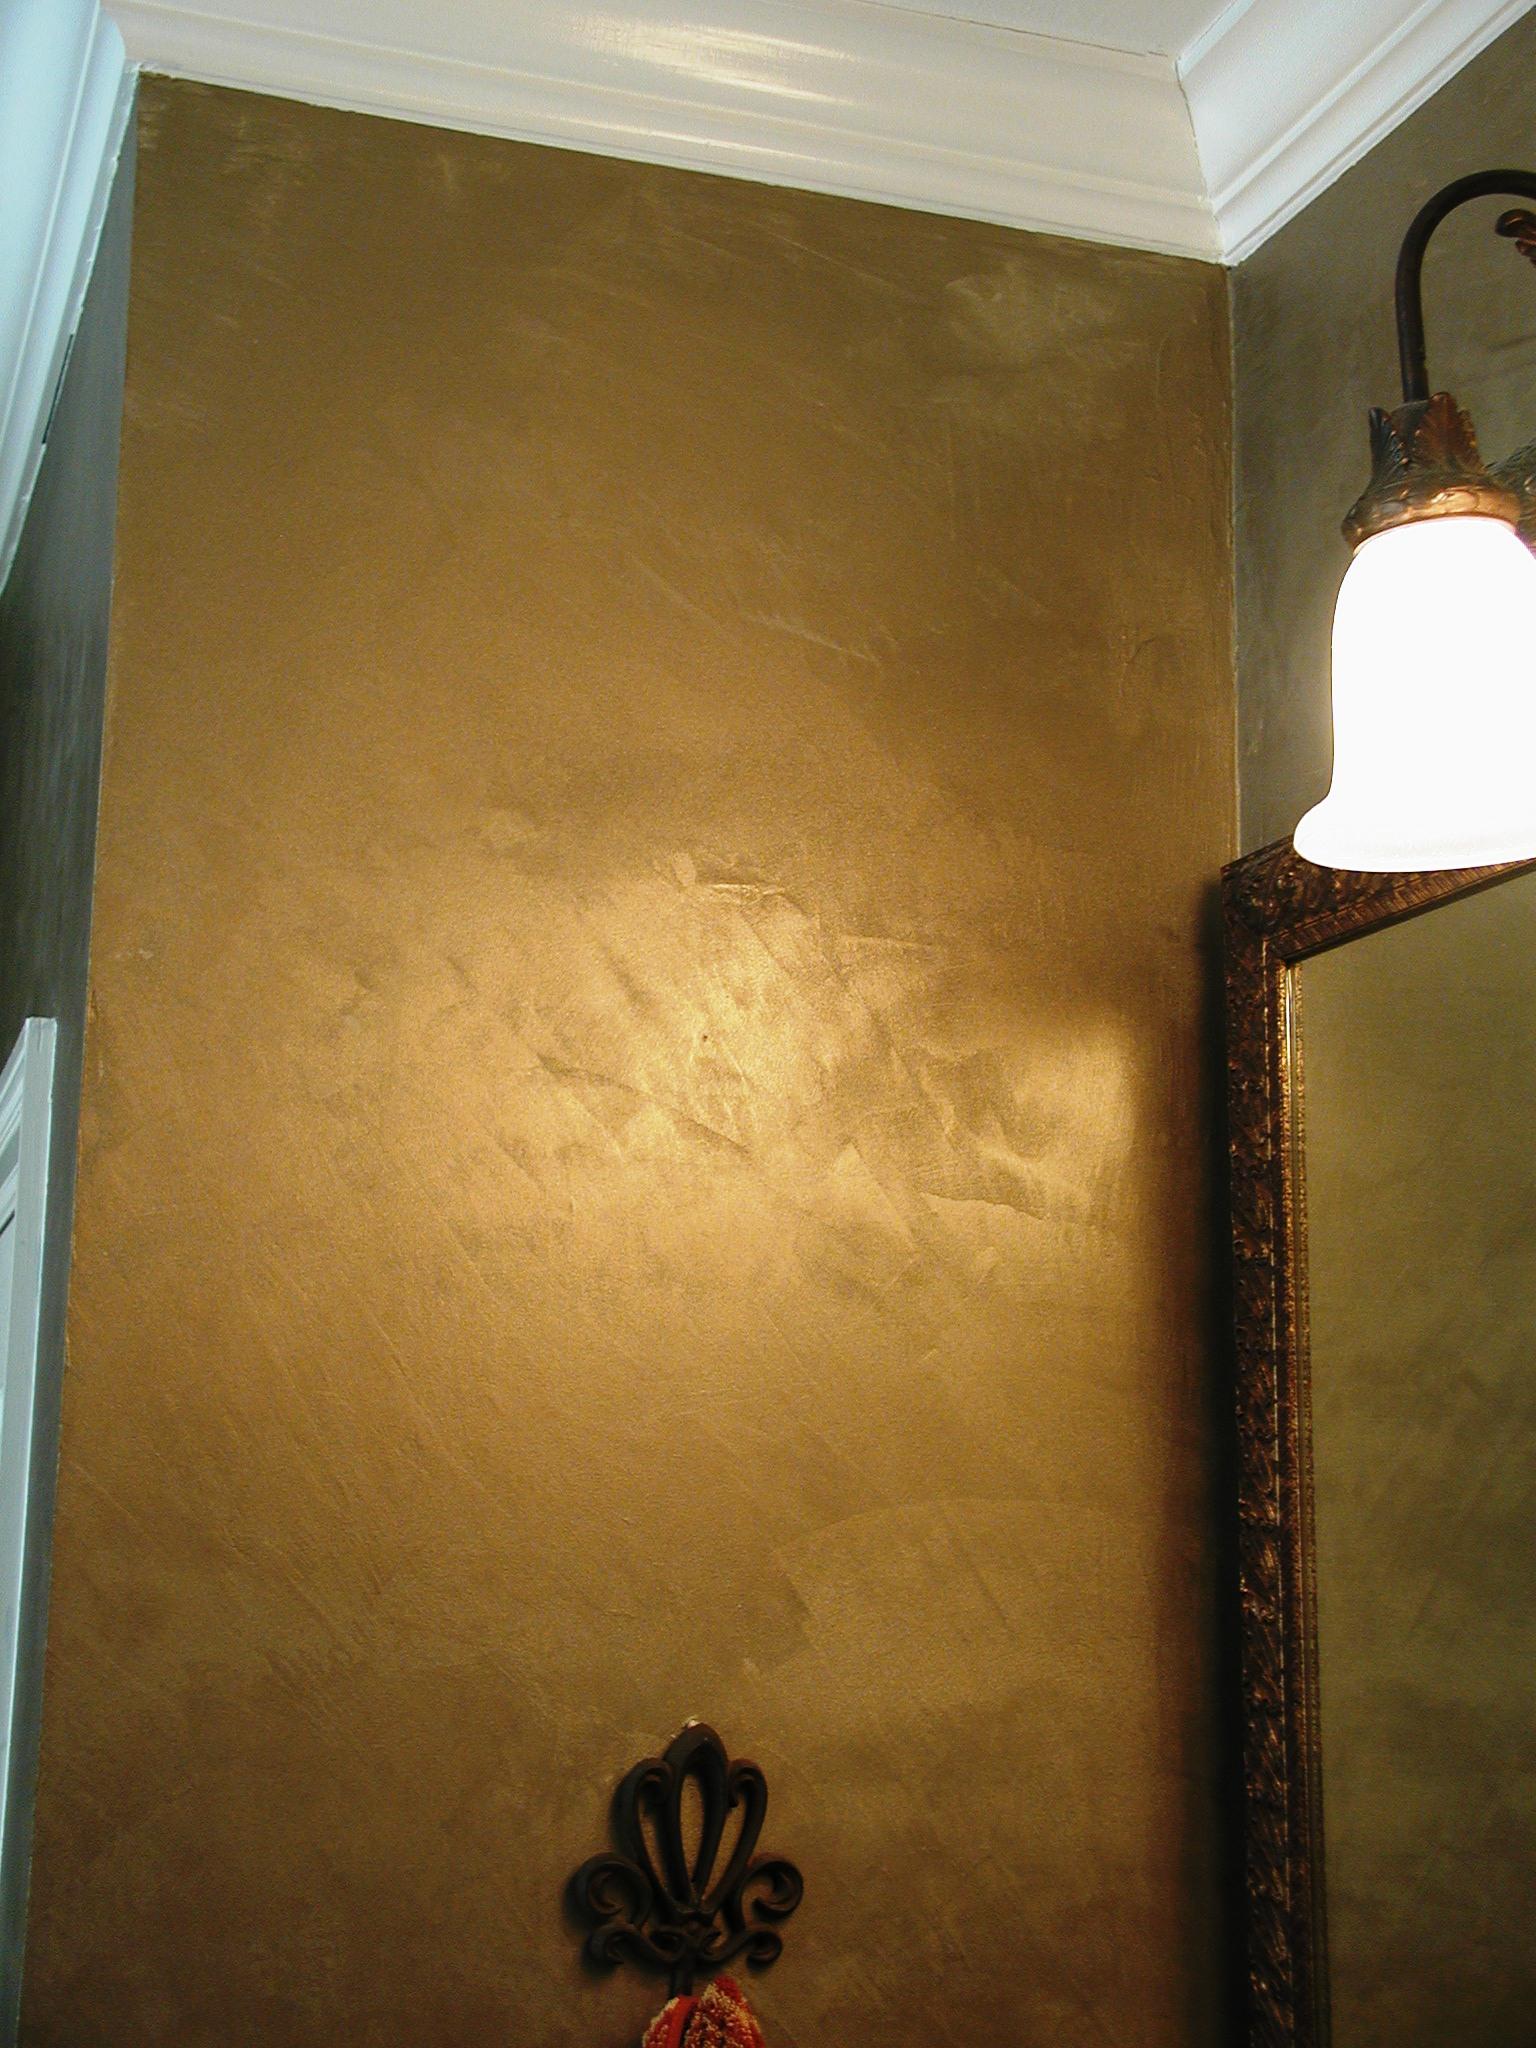 Novacolor Dune - sisustusmaali Gold - kulta